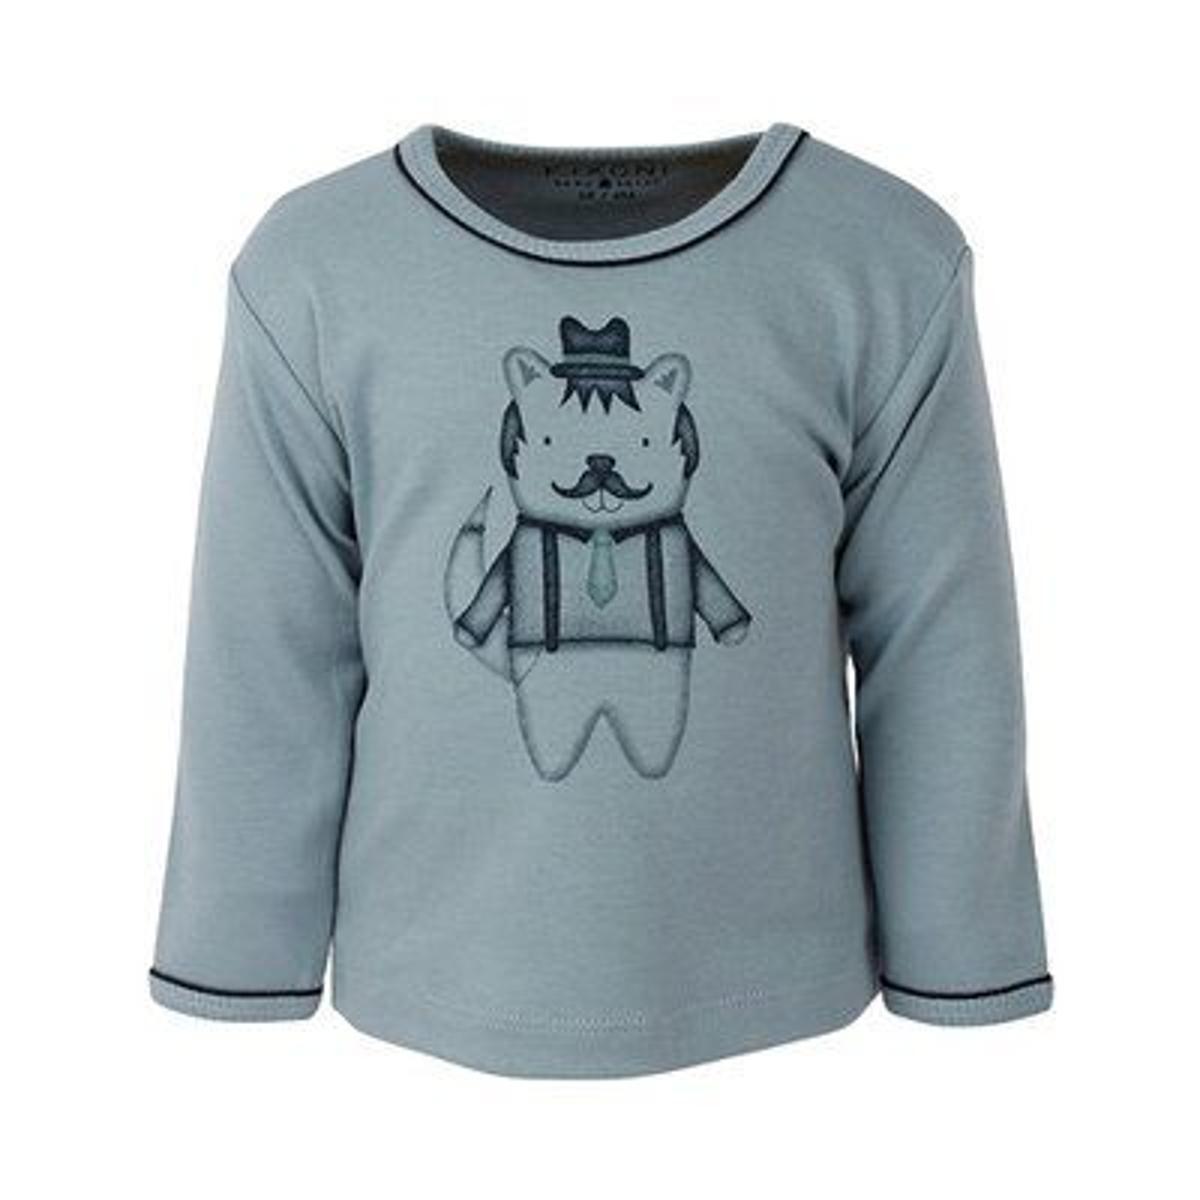 Fixoni T-shirt à manches longues renard top bébé vêtements...